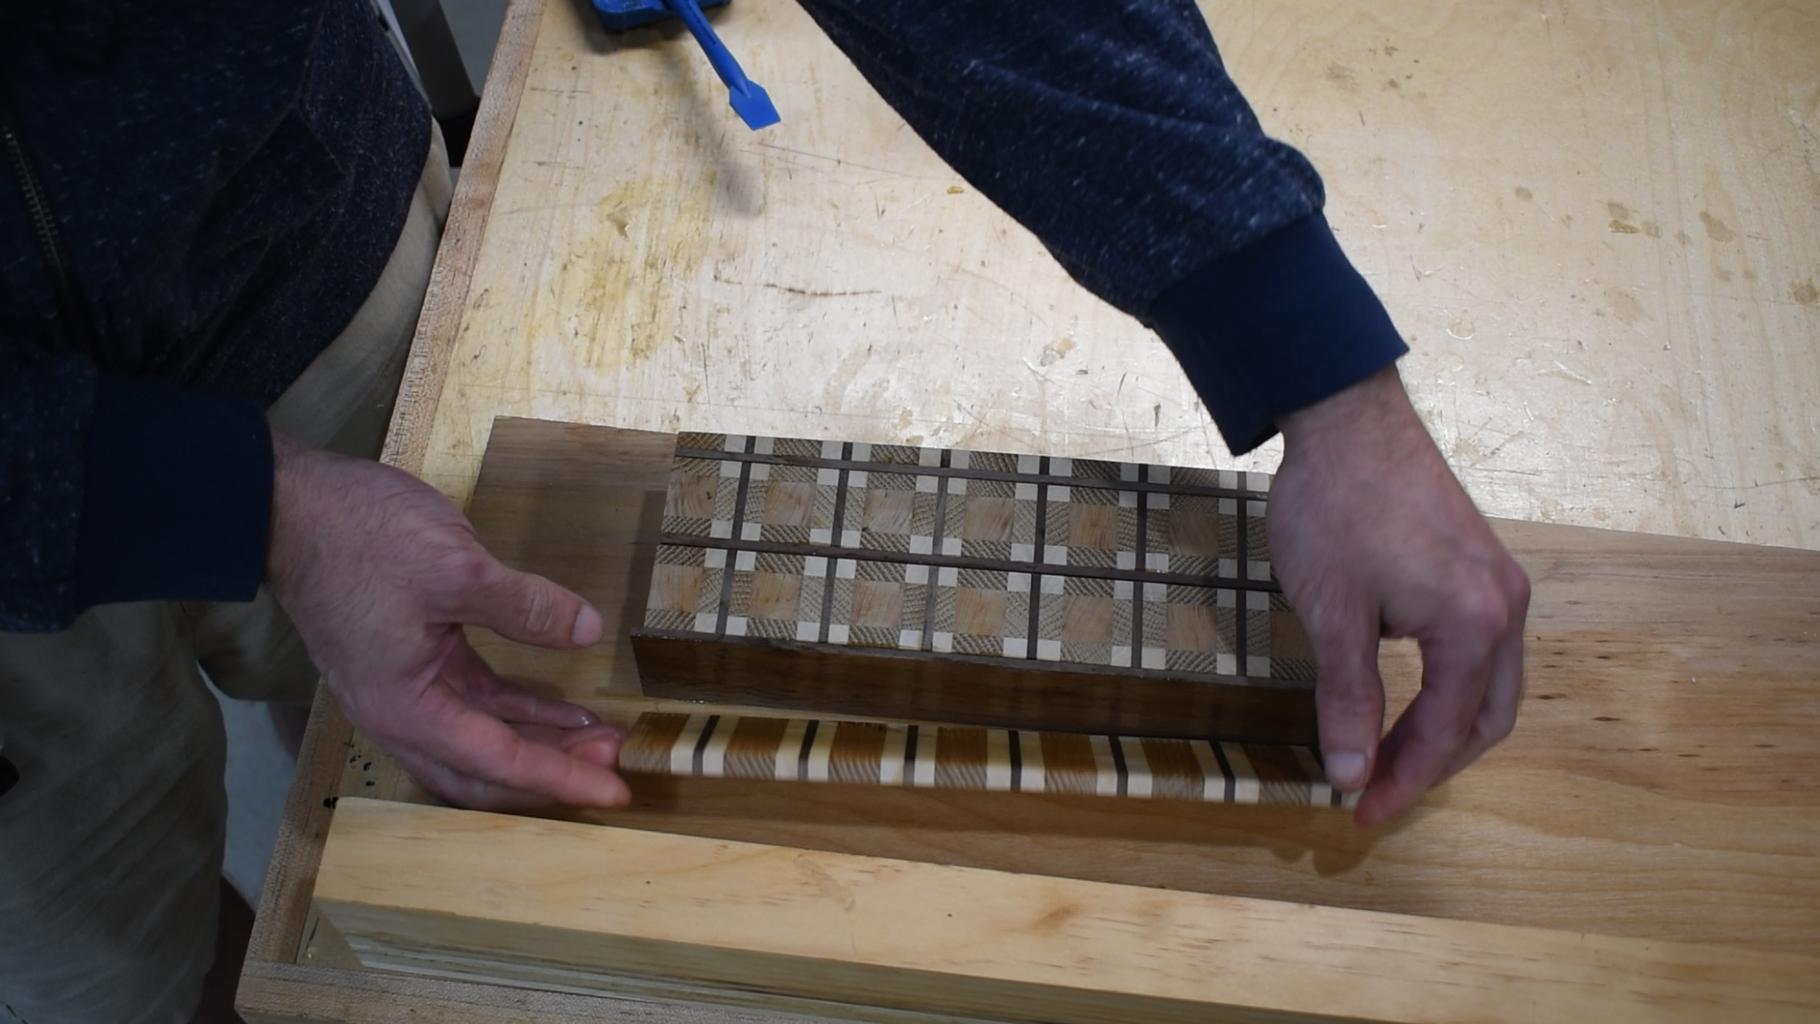 Add Stripes to the Checkerboard